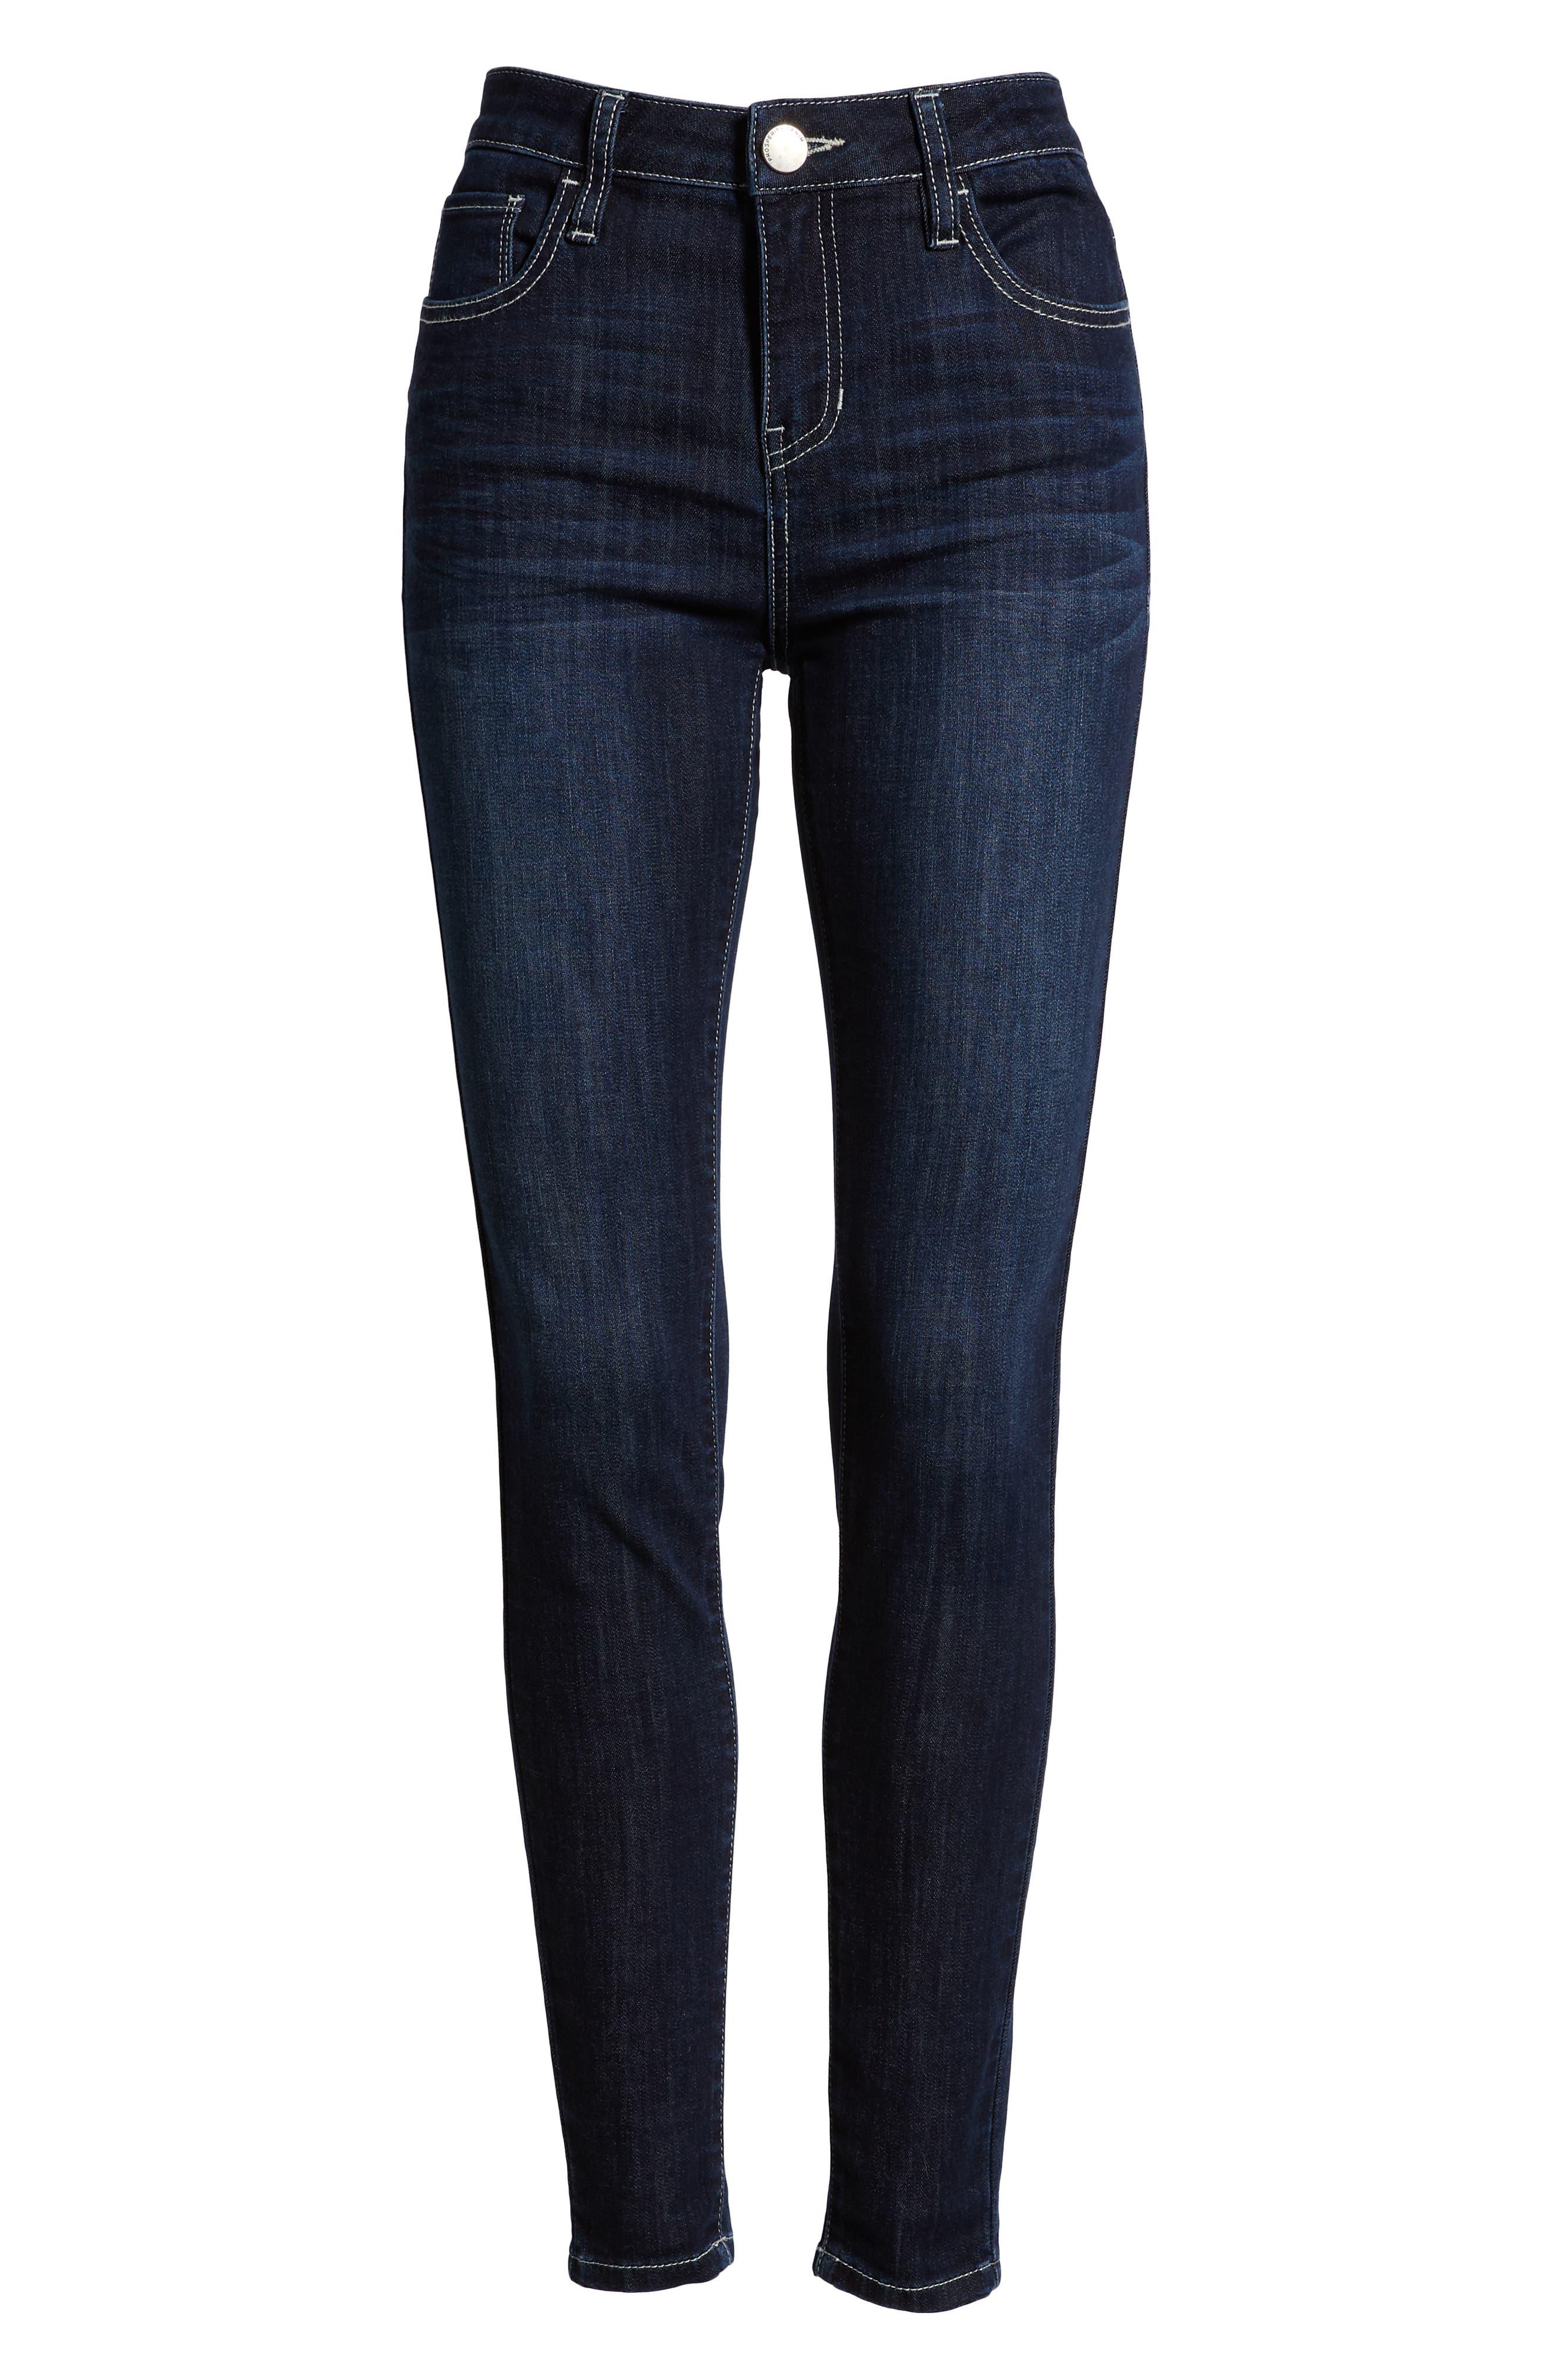 PROSPERITY DENIM, Contrast Stitch Skinny Jeans, Alternate thumbnail 6, color, DARK WASH